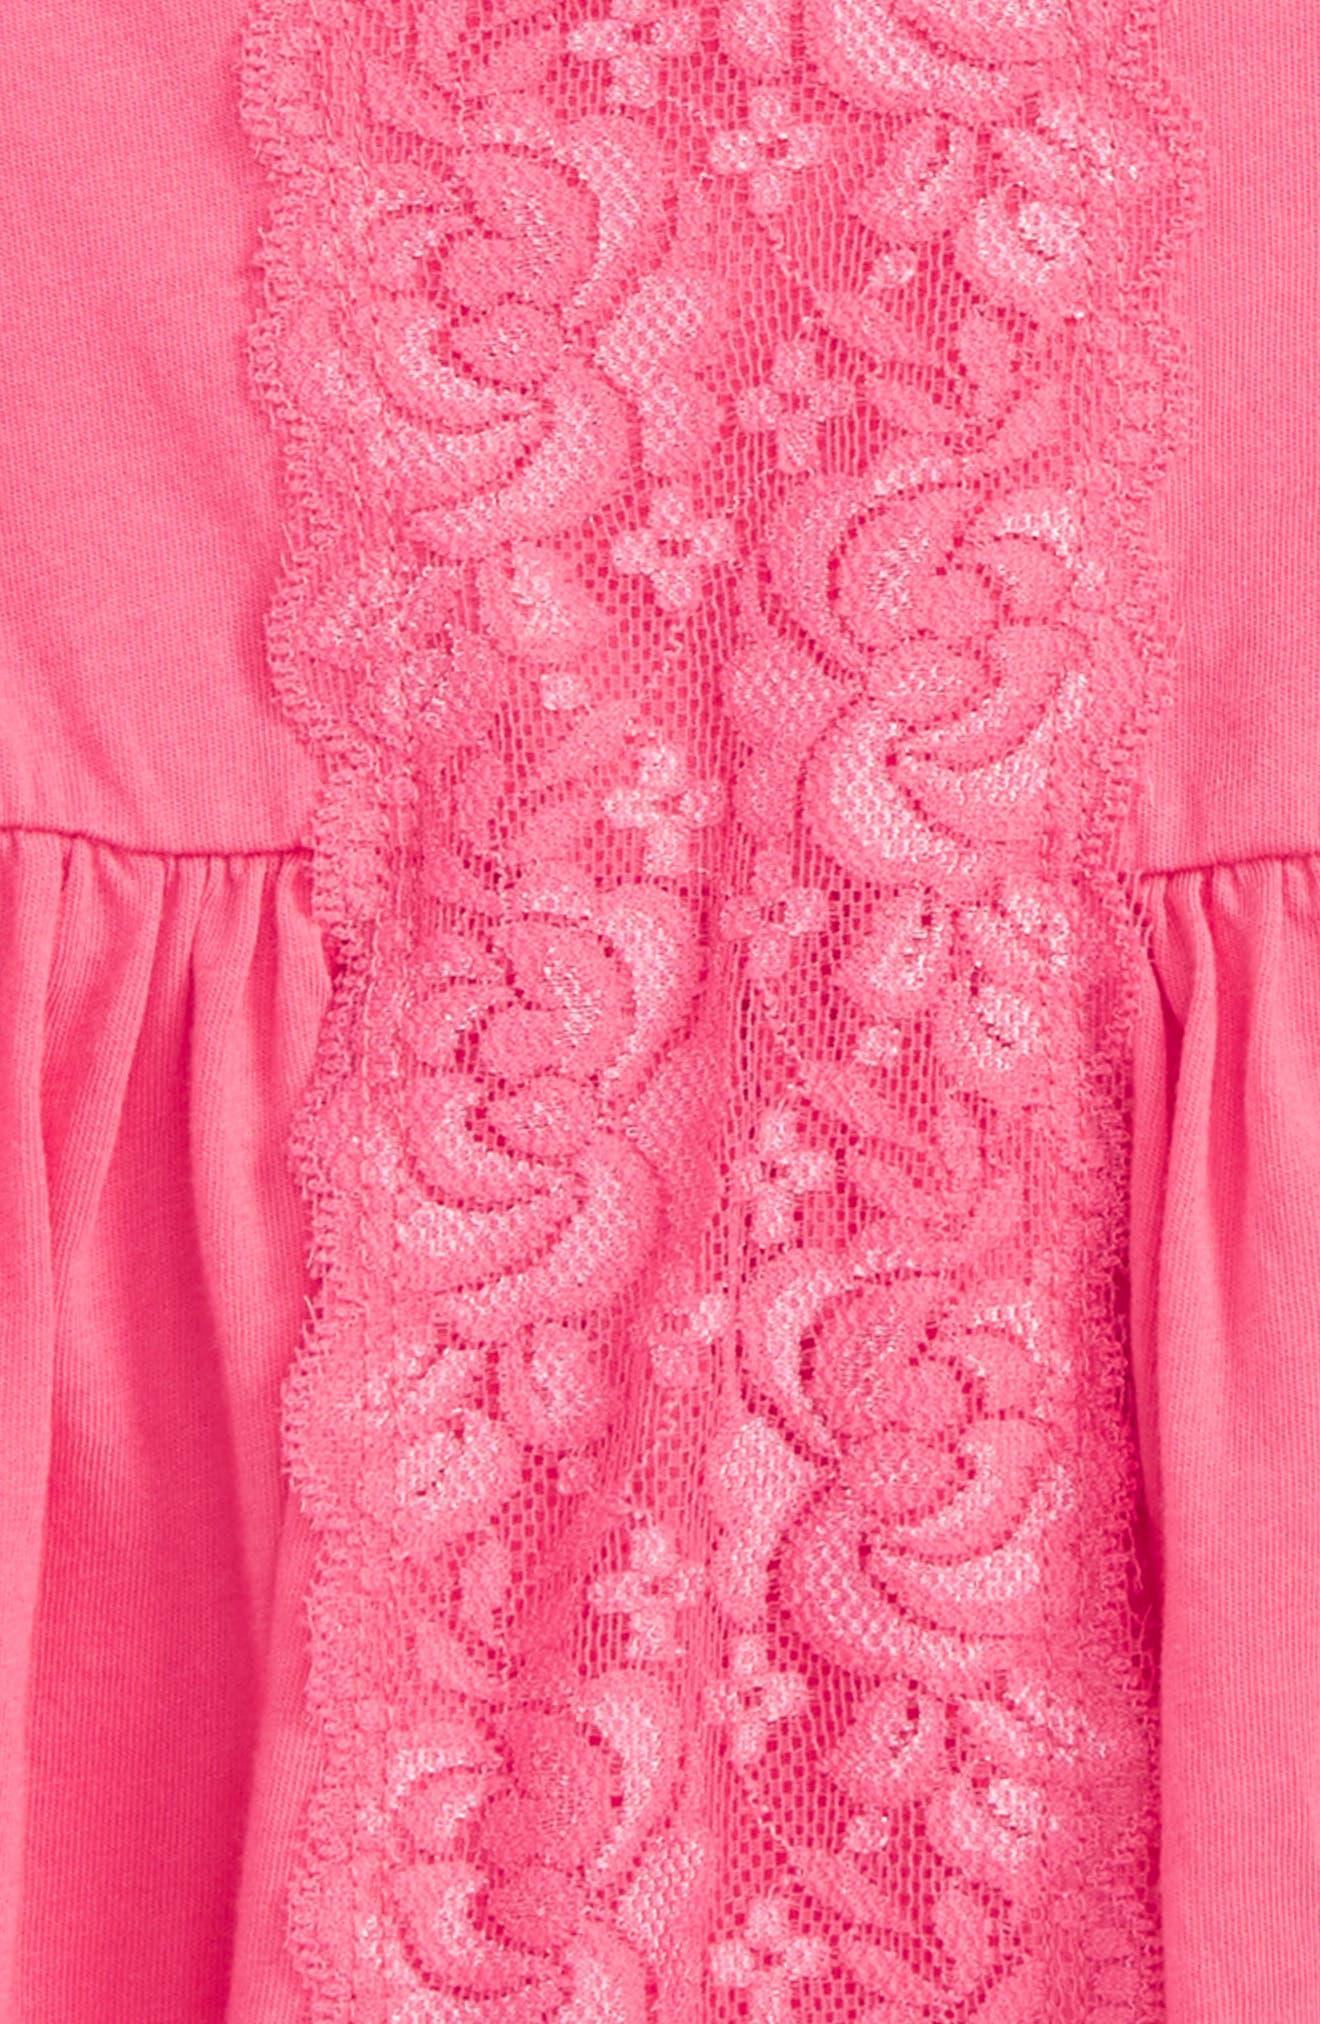 Lace Panel Top,                             Alternate thumbnail 2, color,                             674